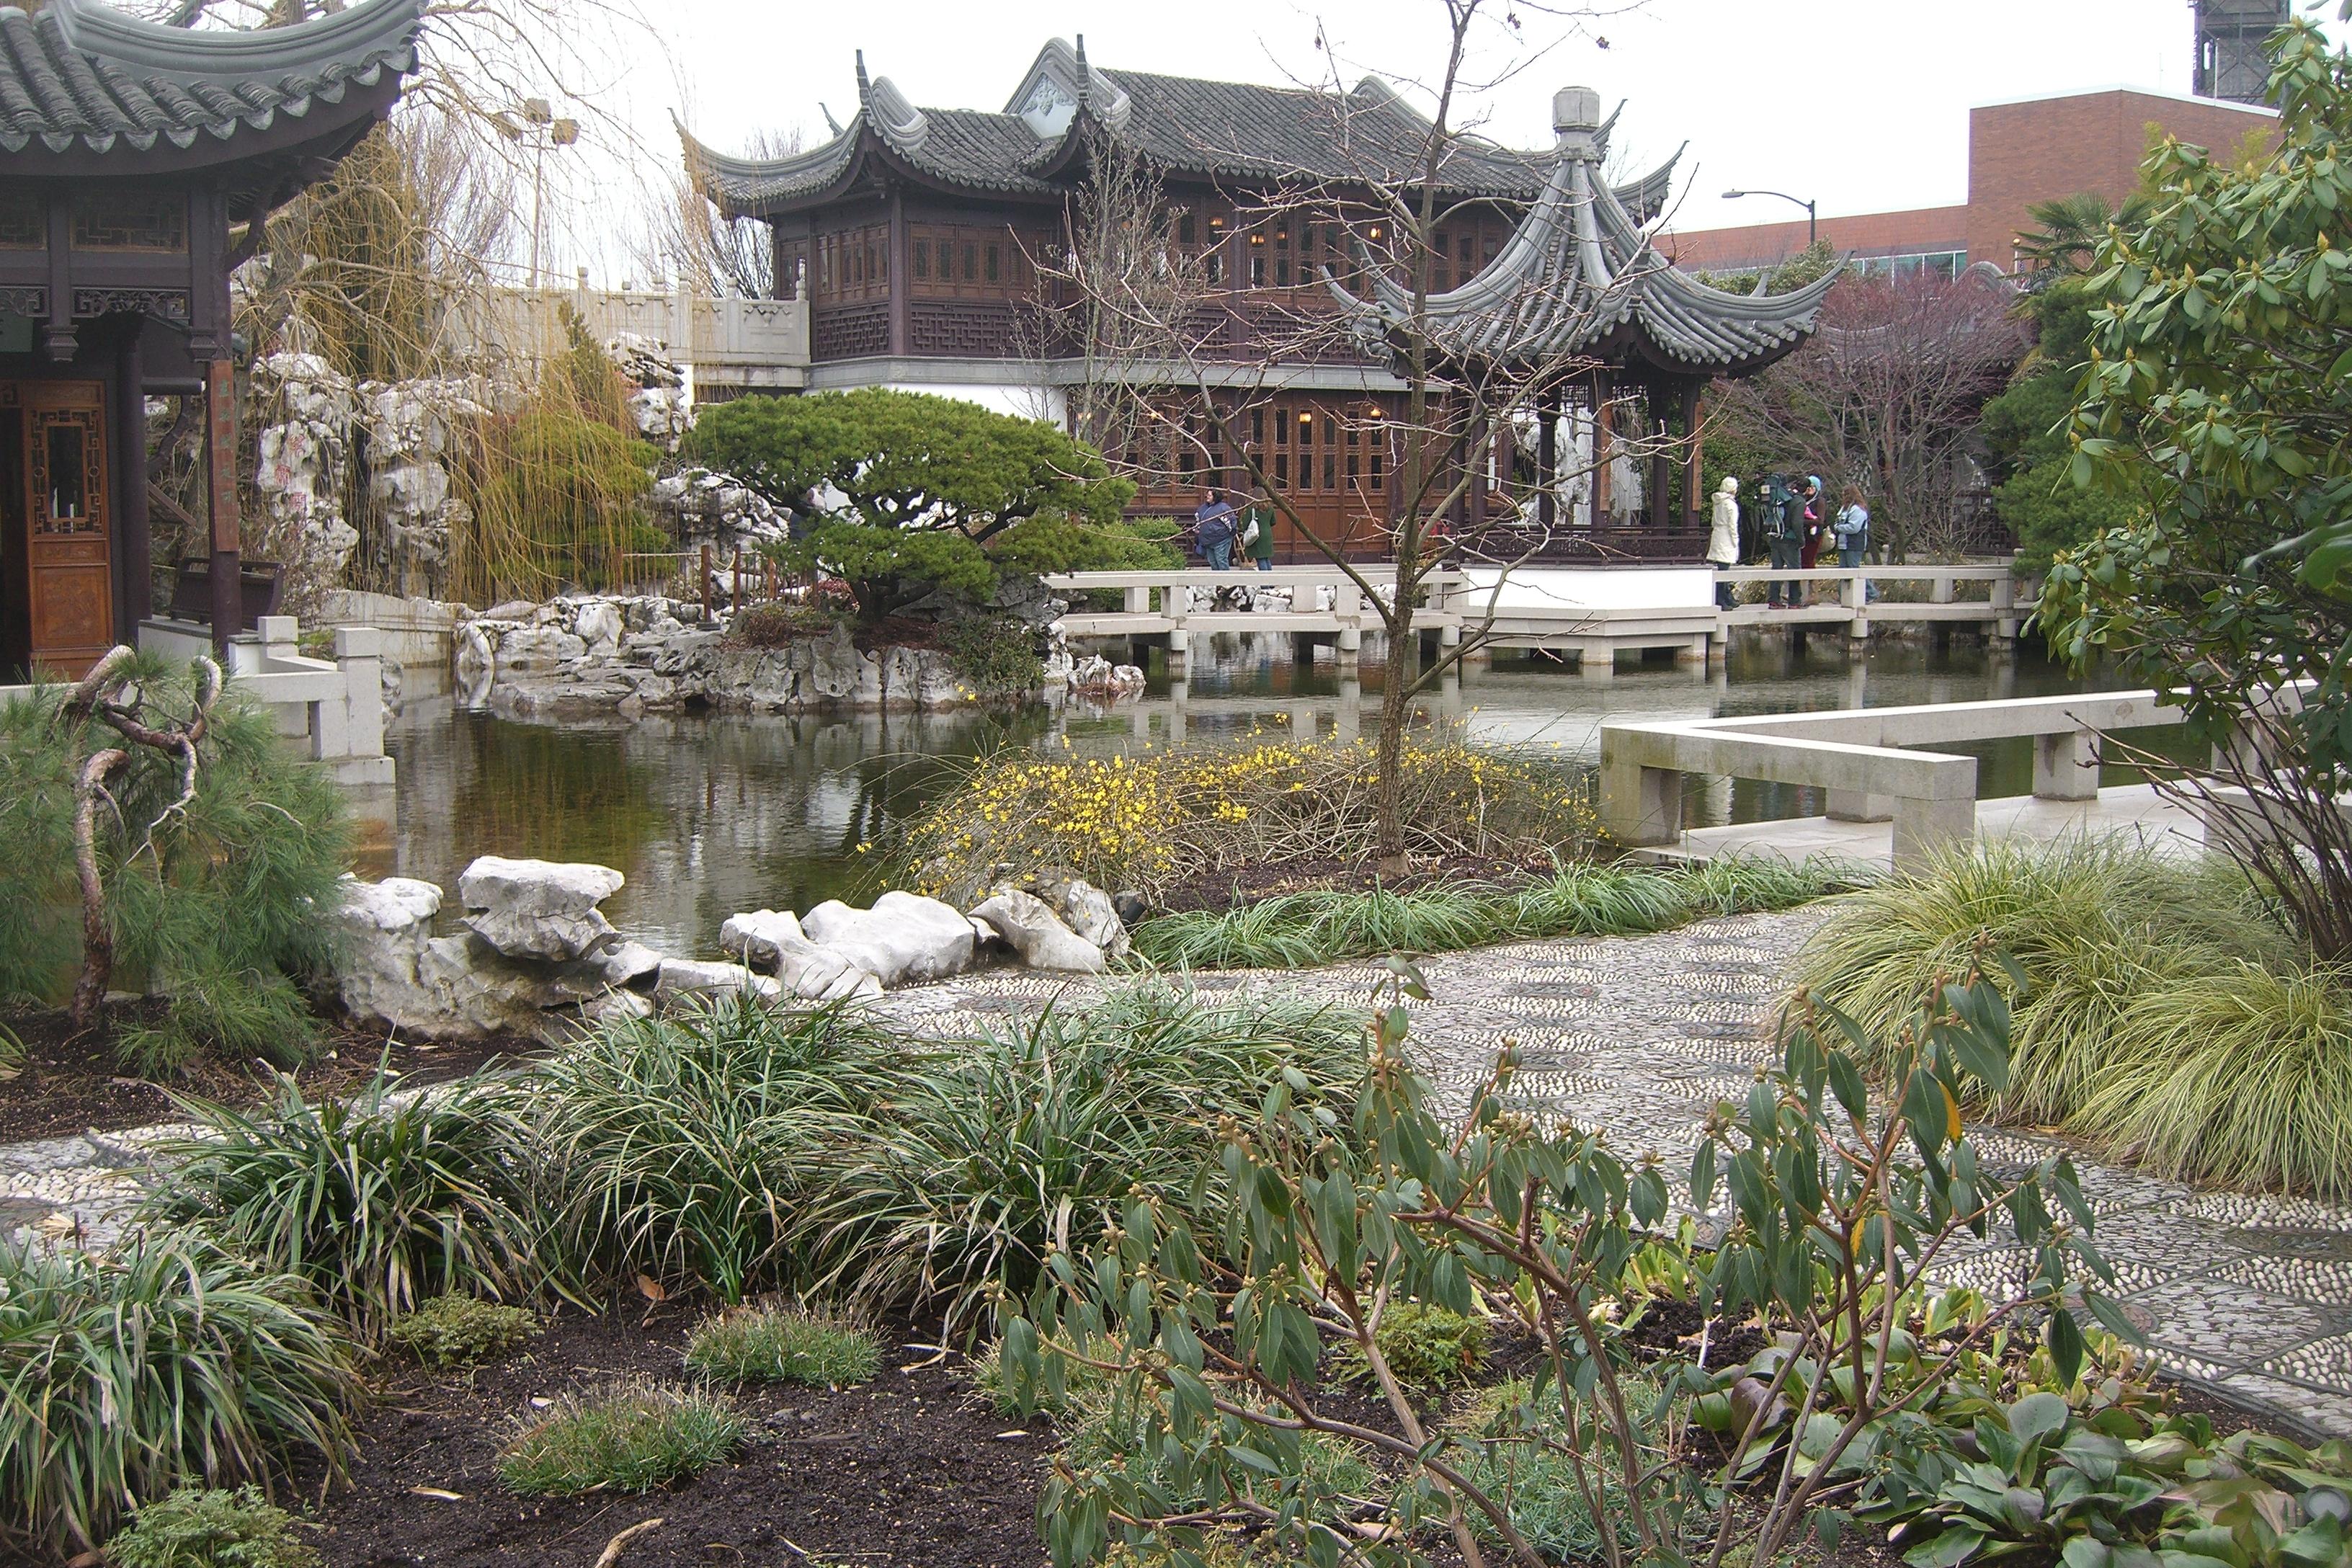 lan su chinese garden kristi does pdx adventures in portland or